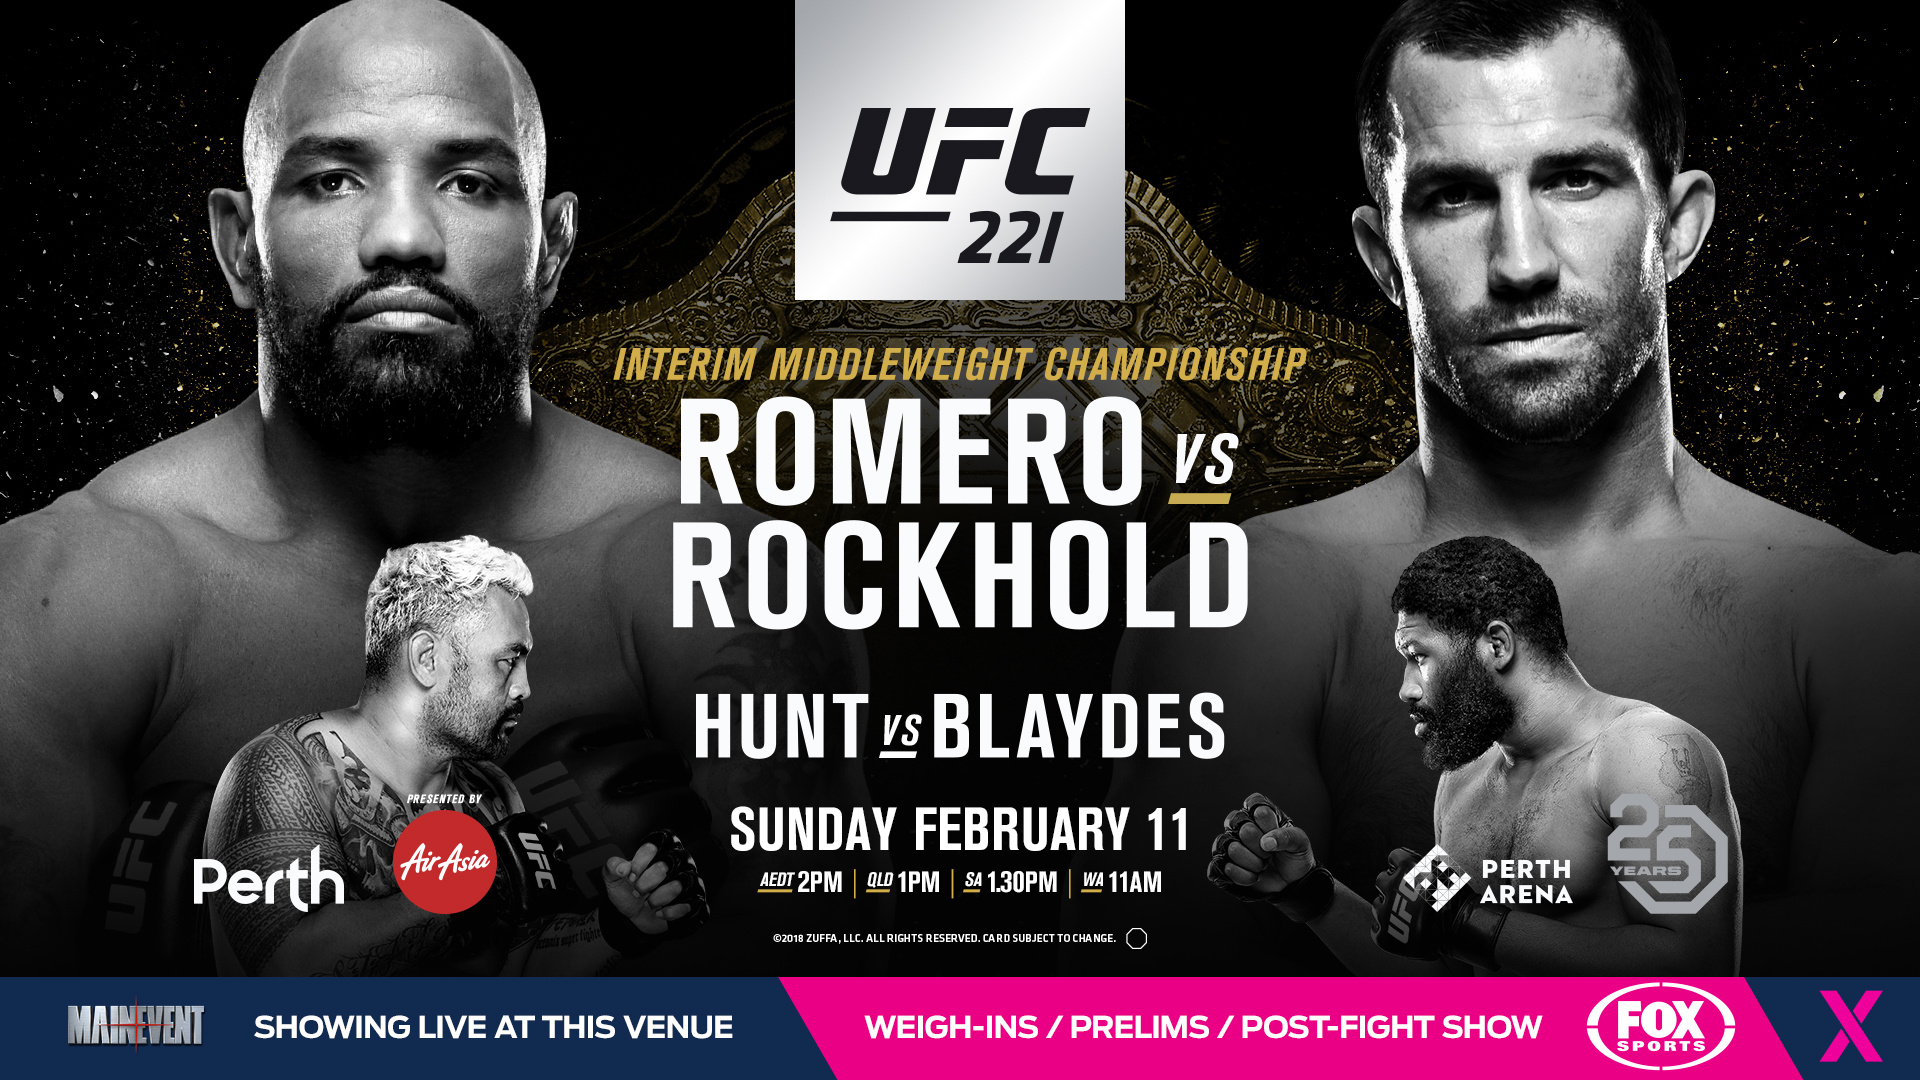 UFC221_FOXSPORTS_16x9_hori.jpg